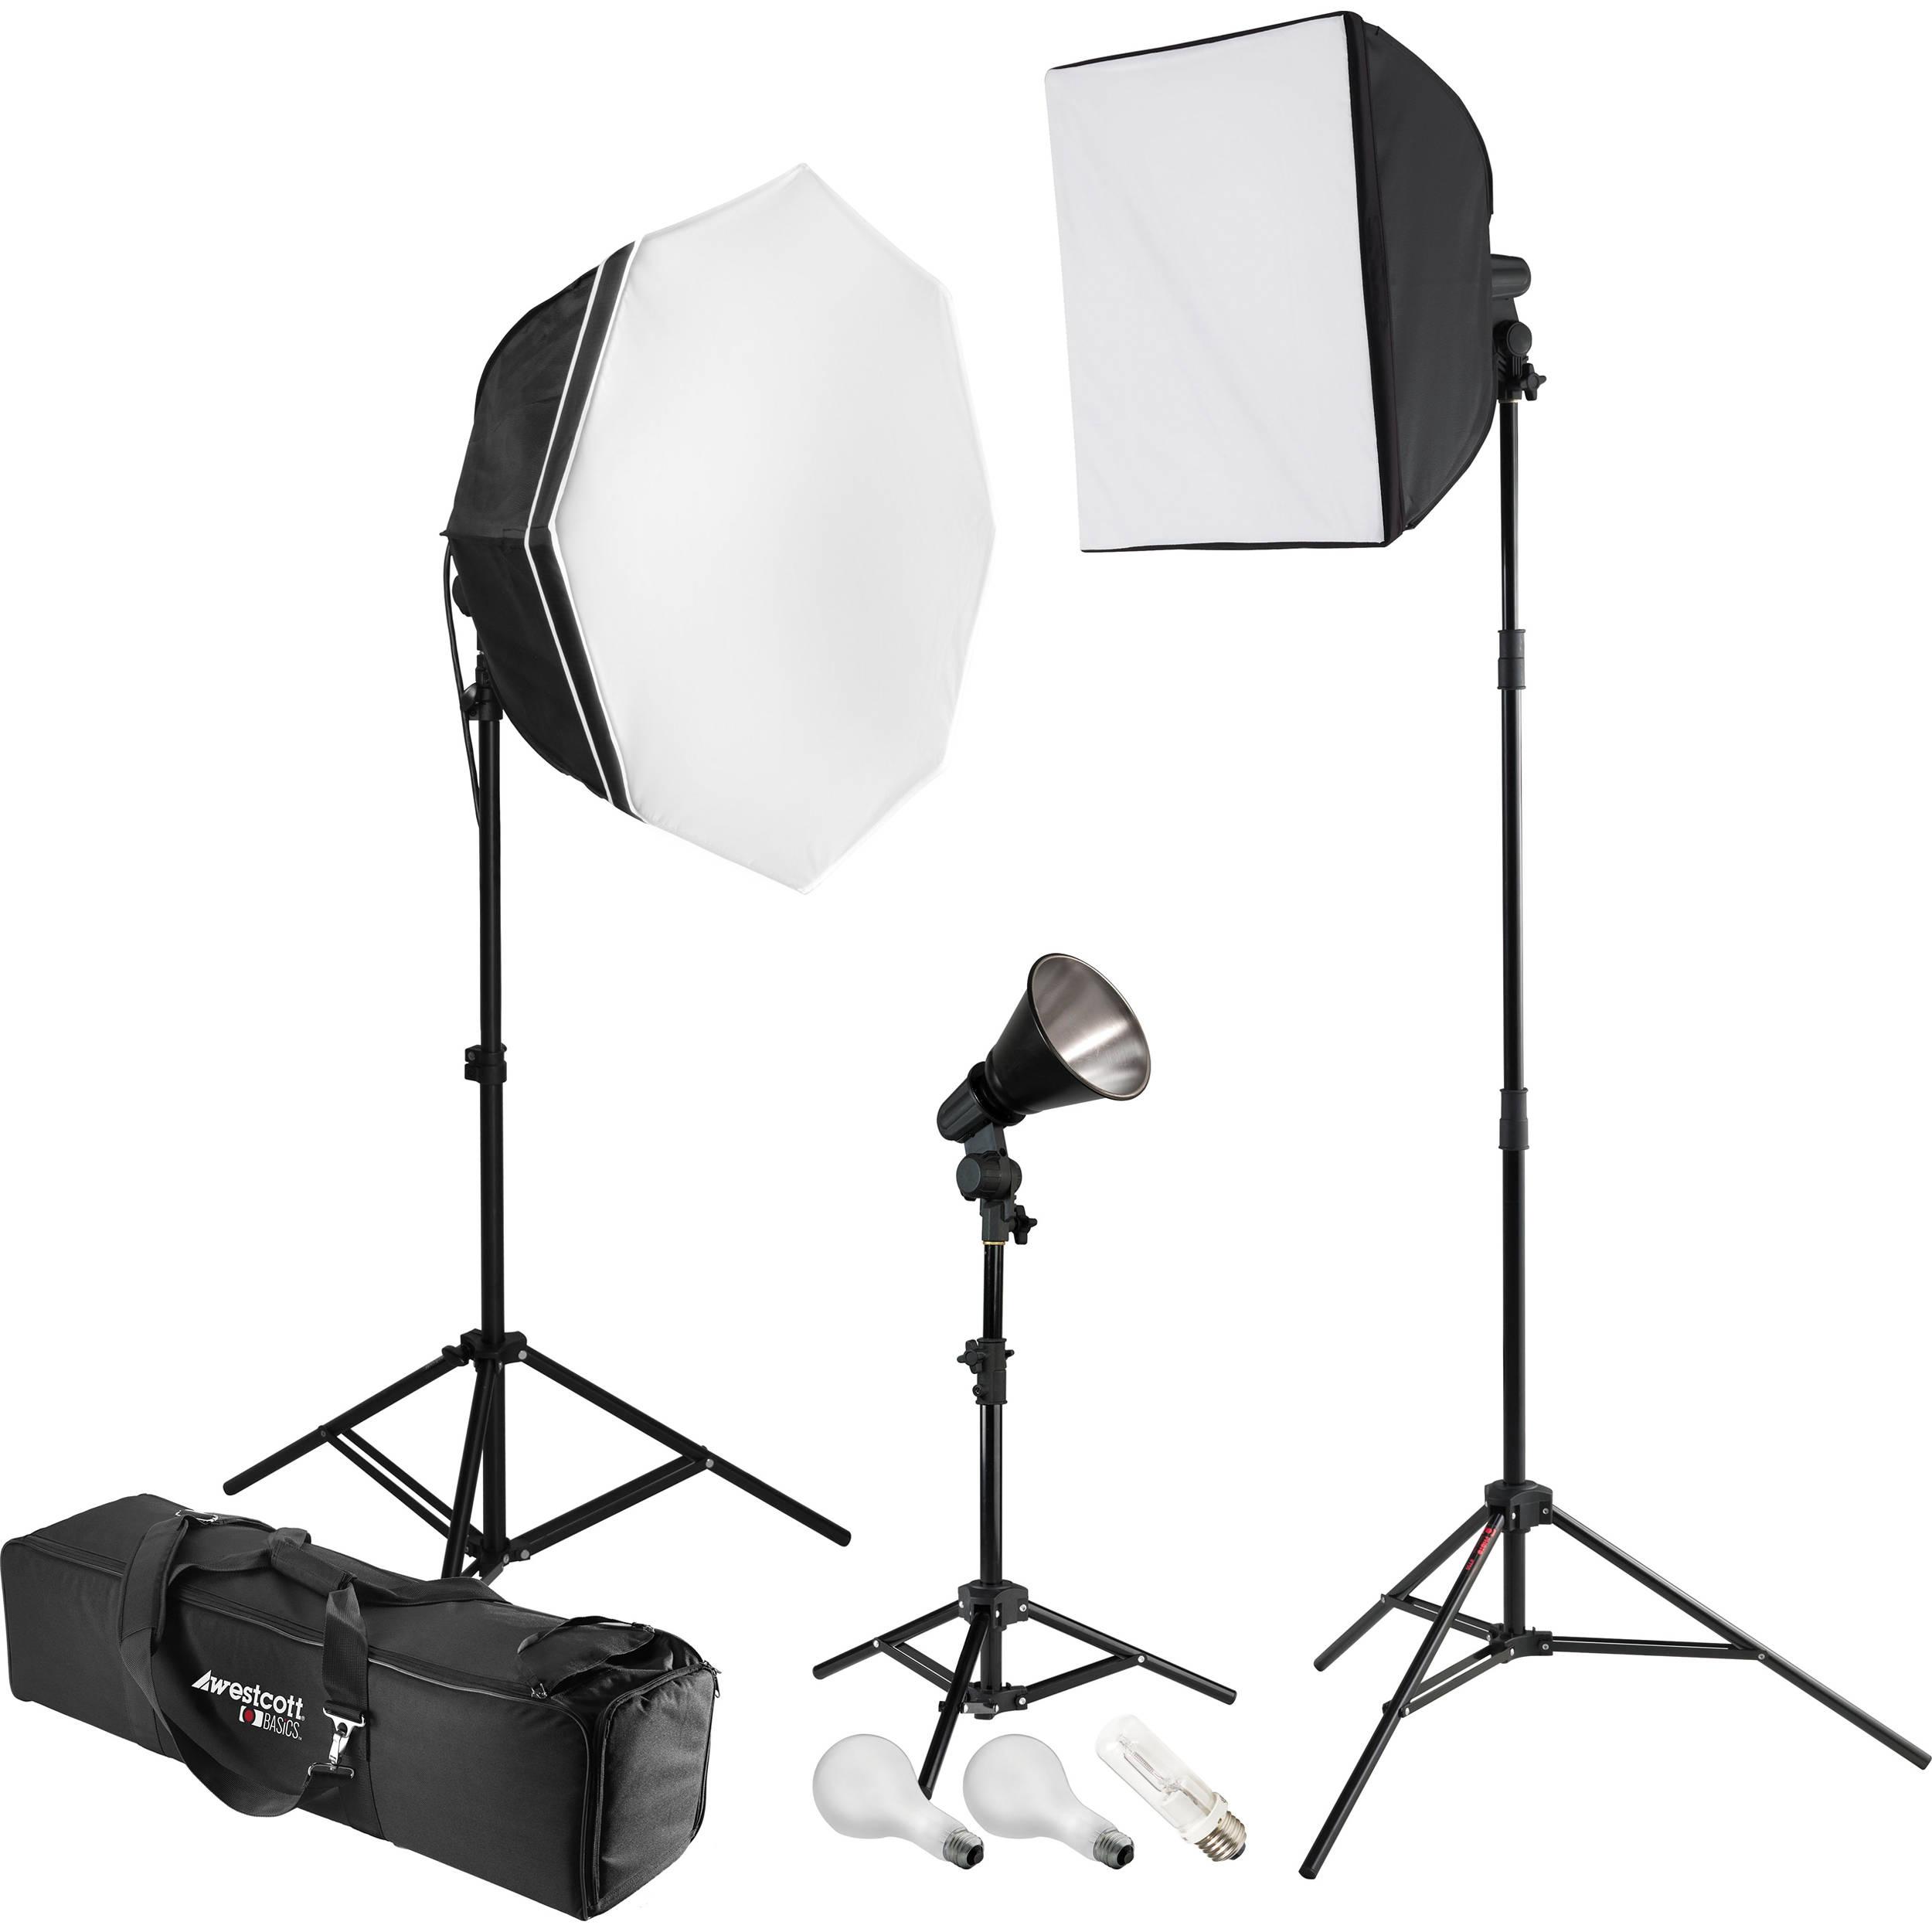 Westcott uLite 3-Light 1100W Tungsten Kit 445 B&H Photo Video